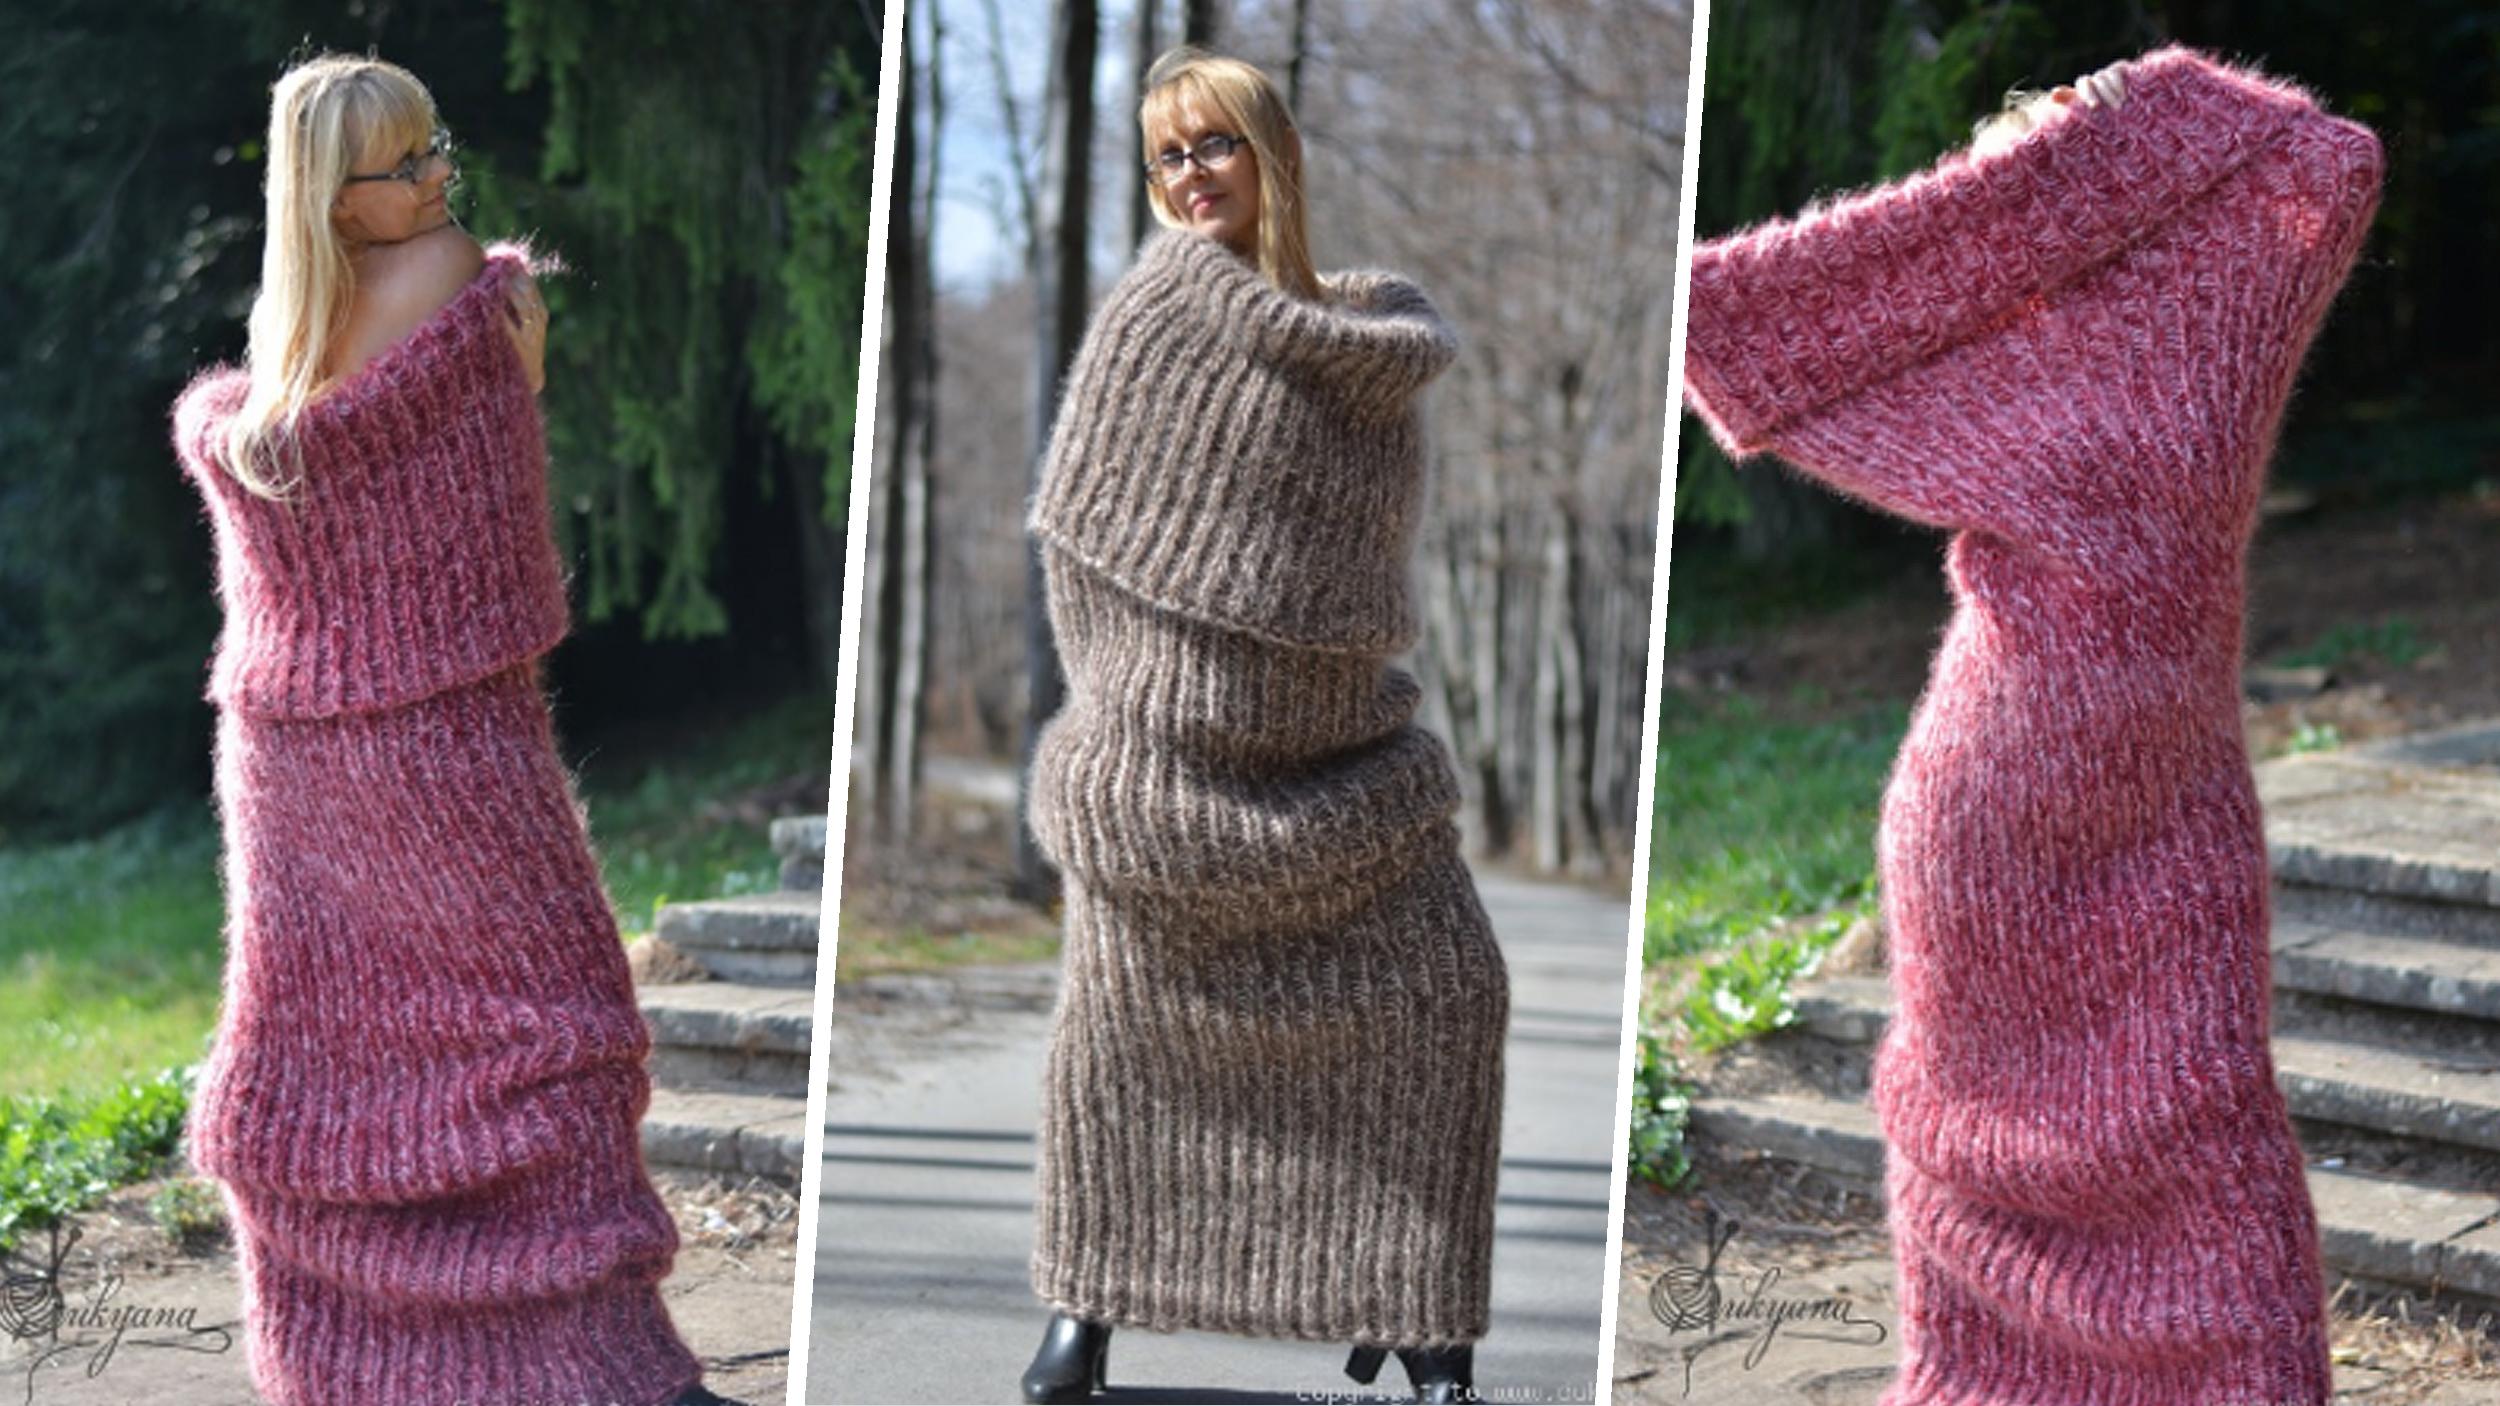 Dukyana\'s floor-length \'tube sock\' scarf goes viral